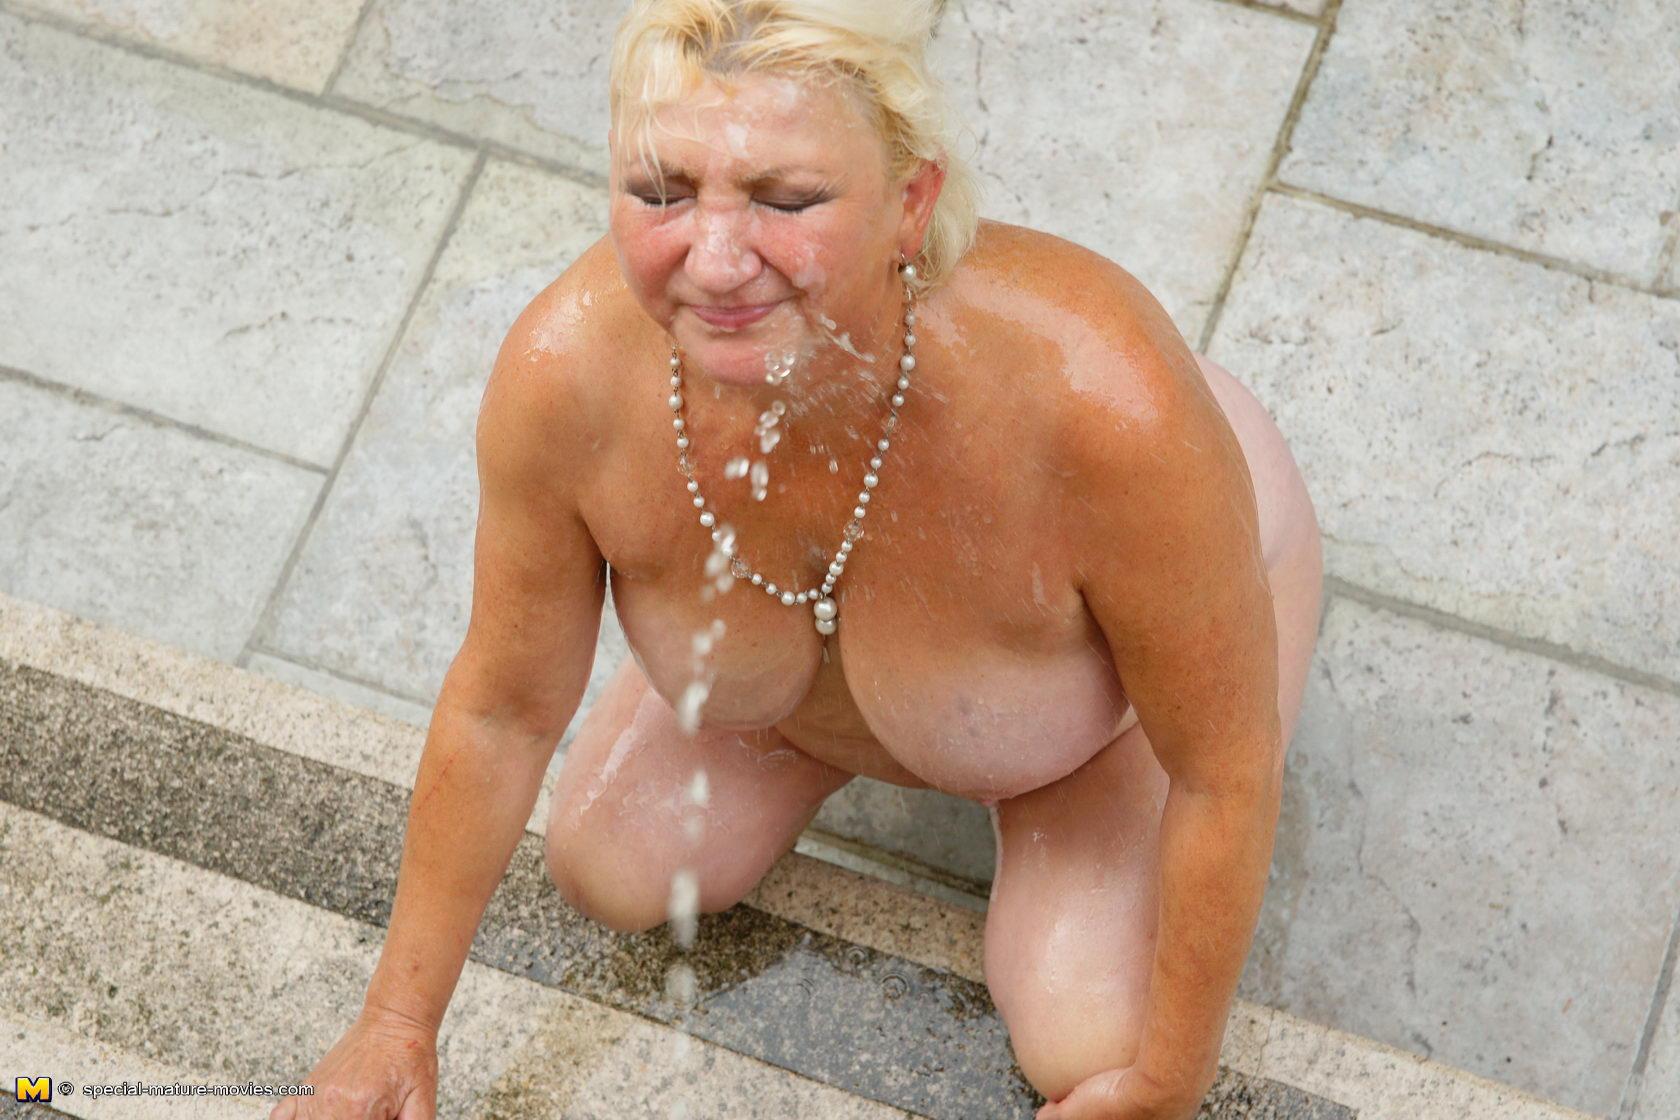 Mature Granny Porn Mature Pussy Pictures Free Masturbation All Are ...